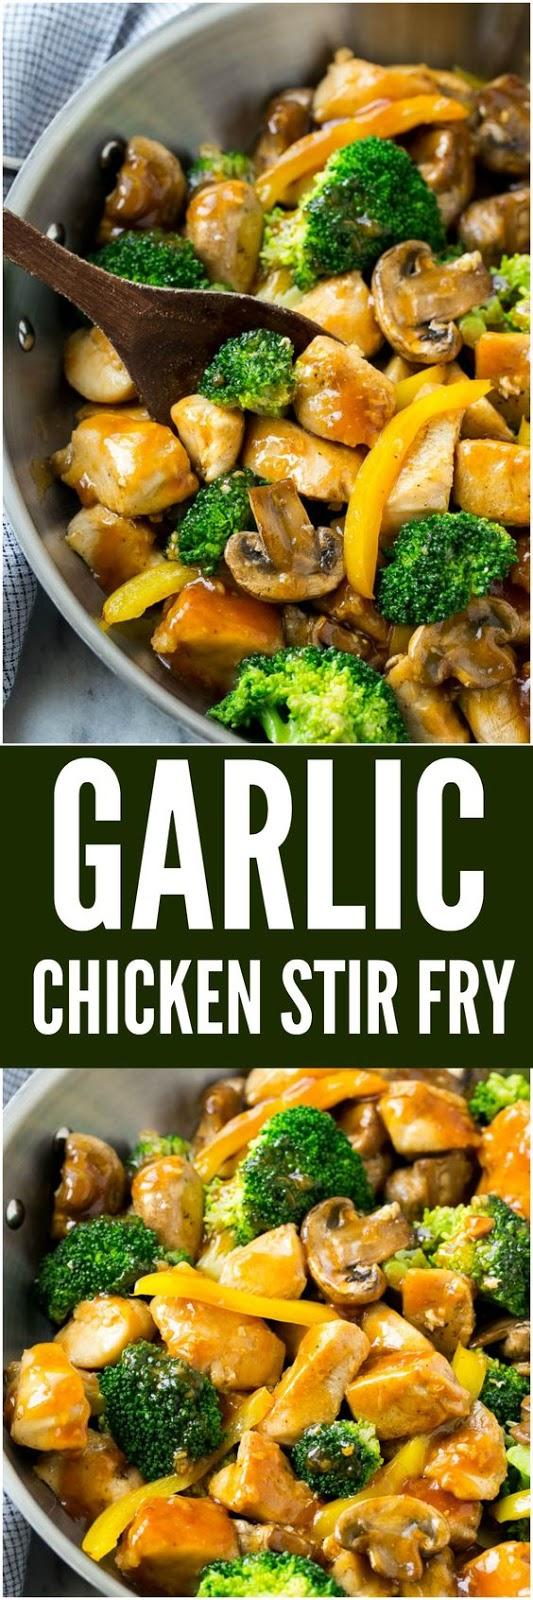 Garlic Chicken Stir Fry Recipe - Healthy Recipes